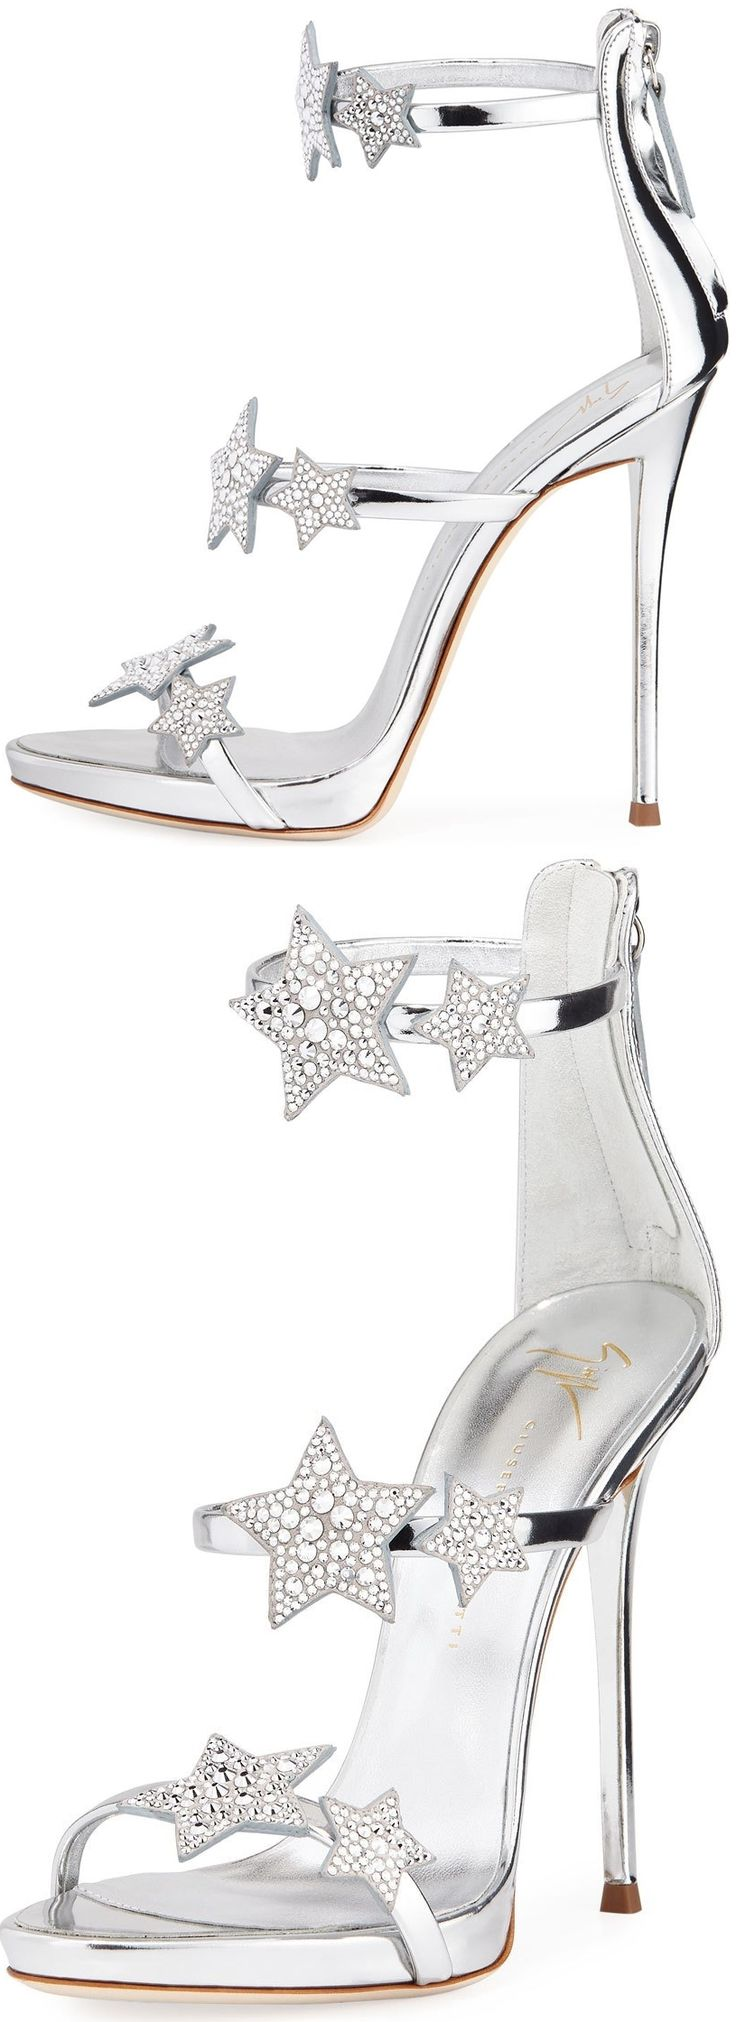 Giuseppe Zanotti's metallic leather sandal with Swarovski crystal star ornaments